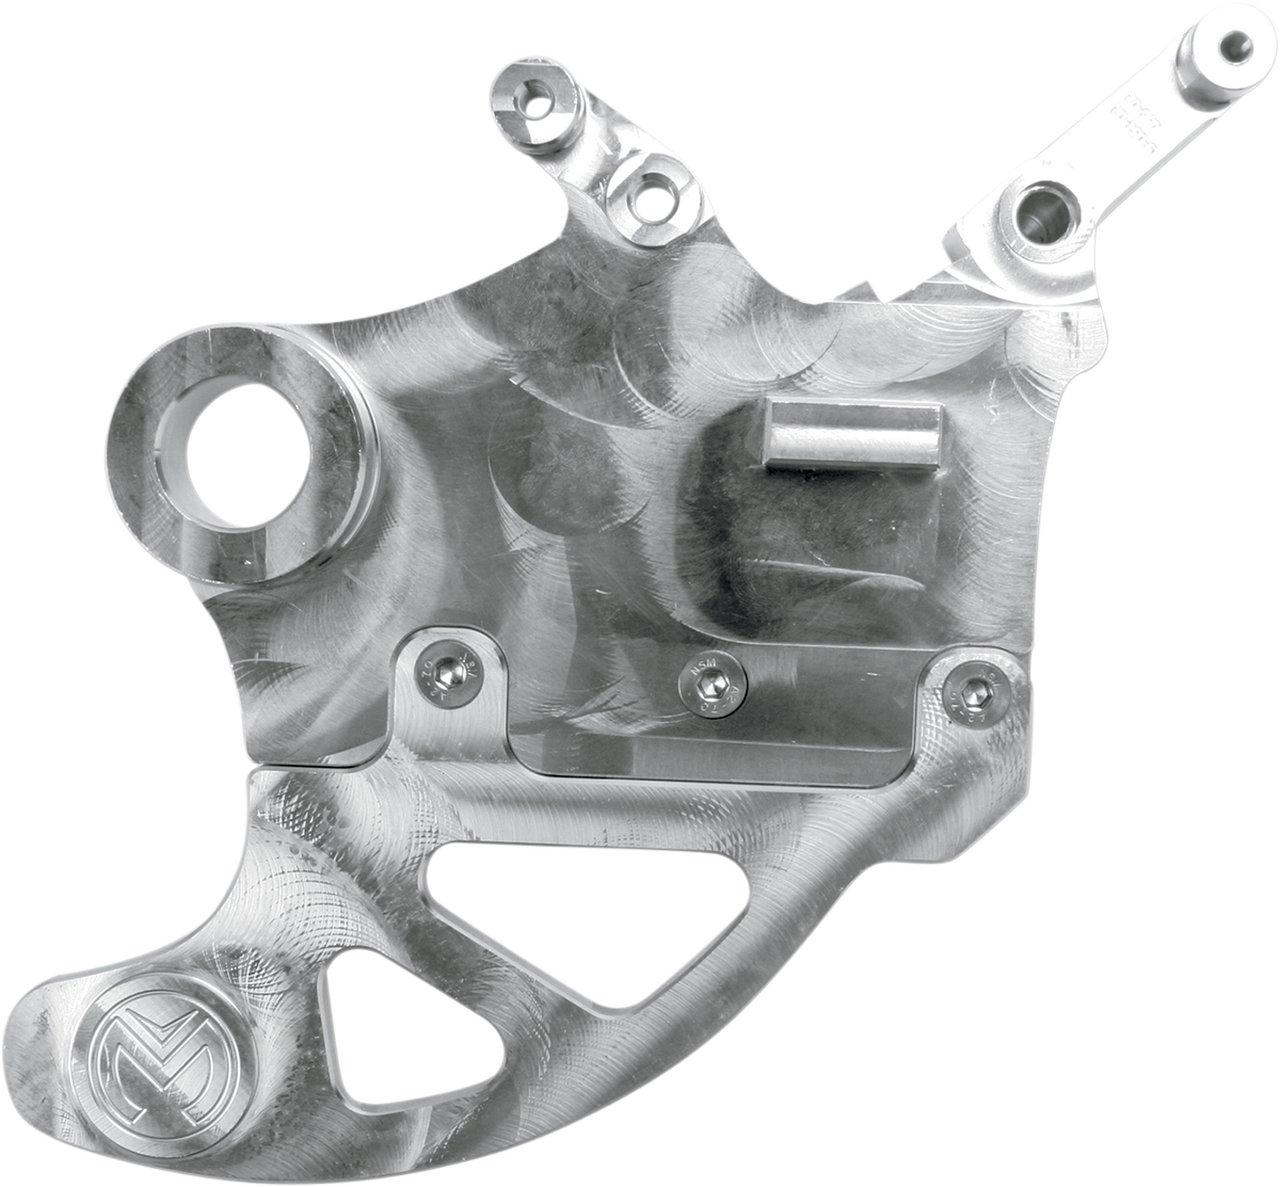 【MOOSE RACING】PRO 剎車碟盤護蓋組 [1711-0460] - 「Webike-摩托百貨」